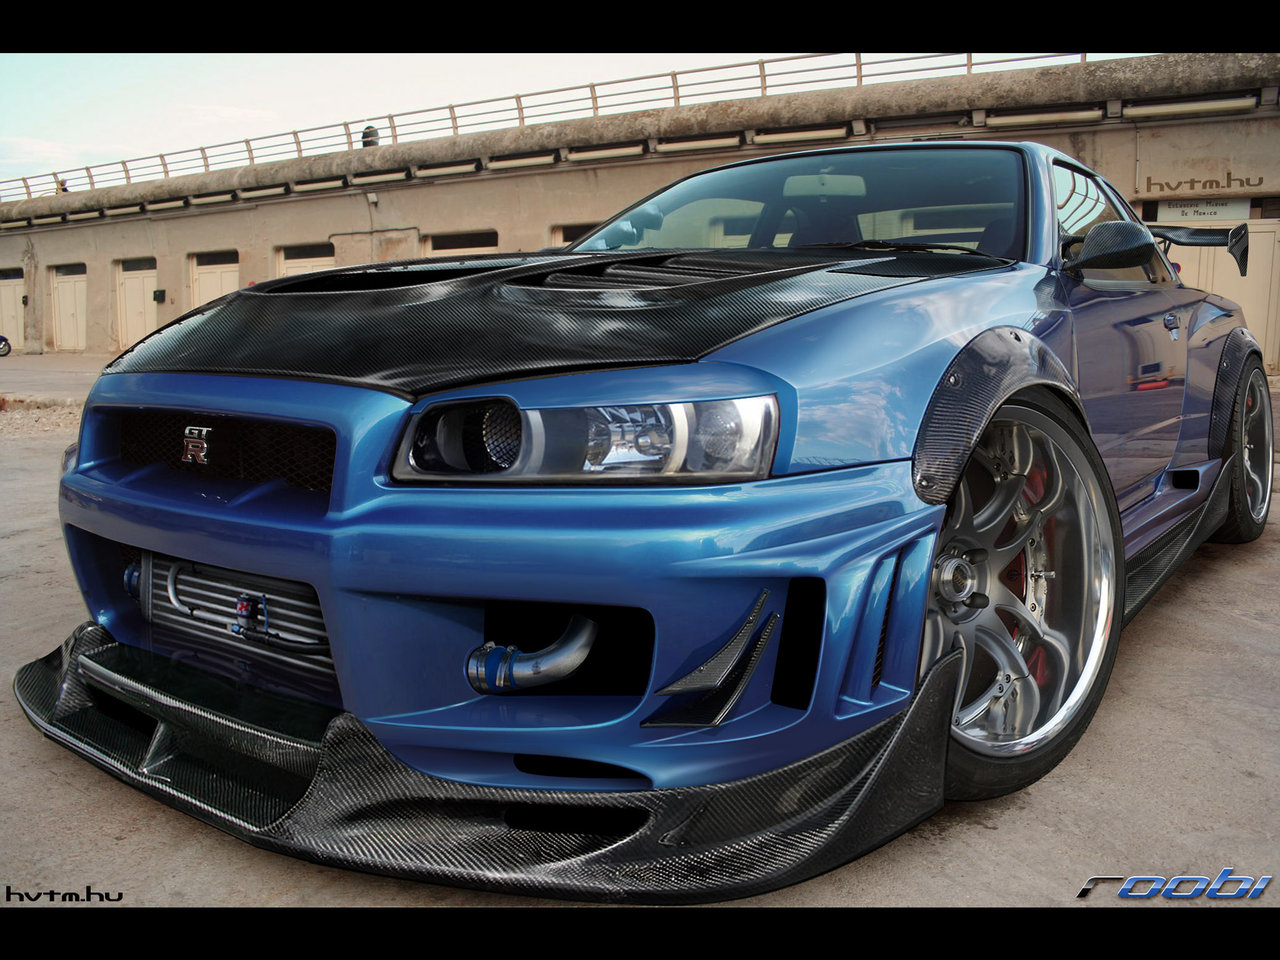 Nissan Skyline GTR Wallpaper HD Download